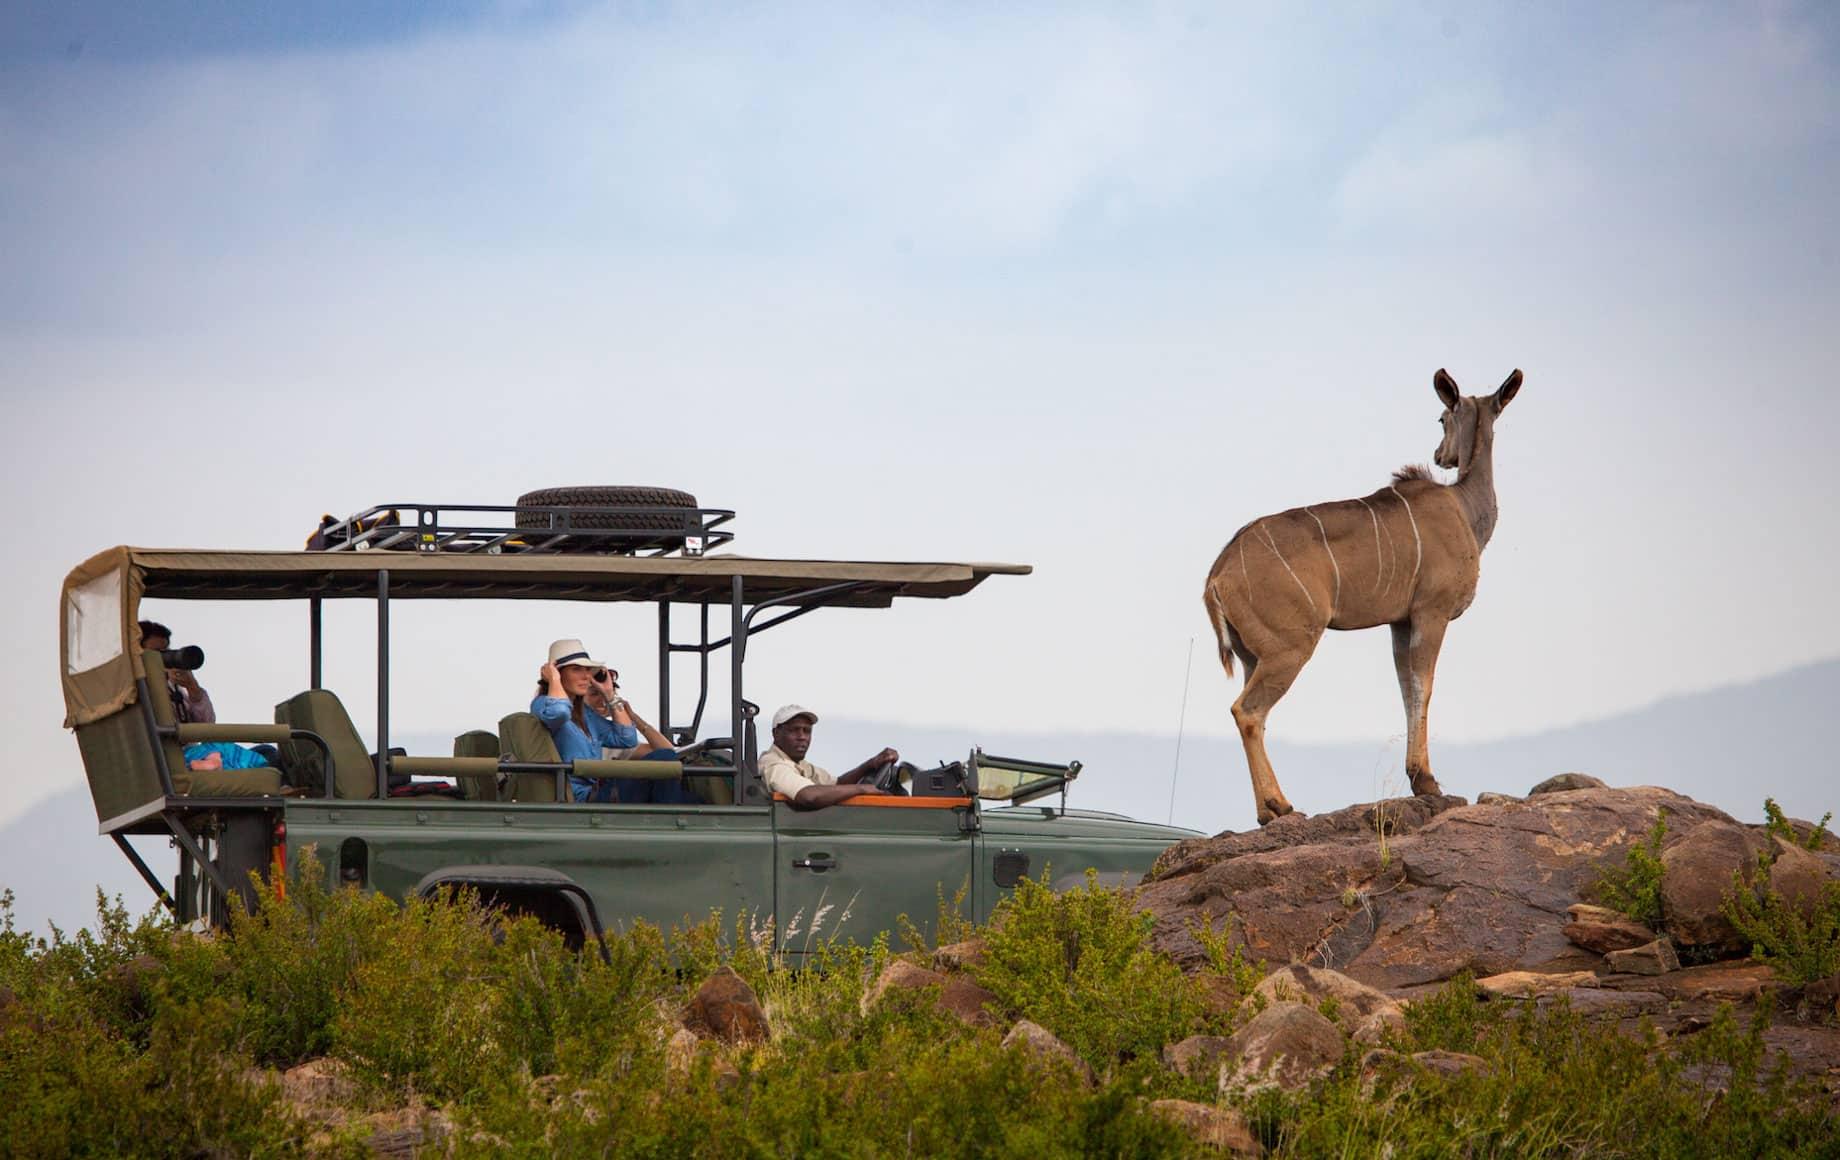 Safari-goers see African deer at Loisaba Conservancy